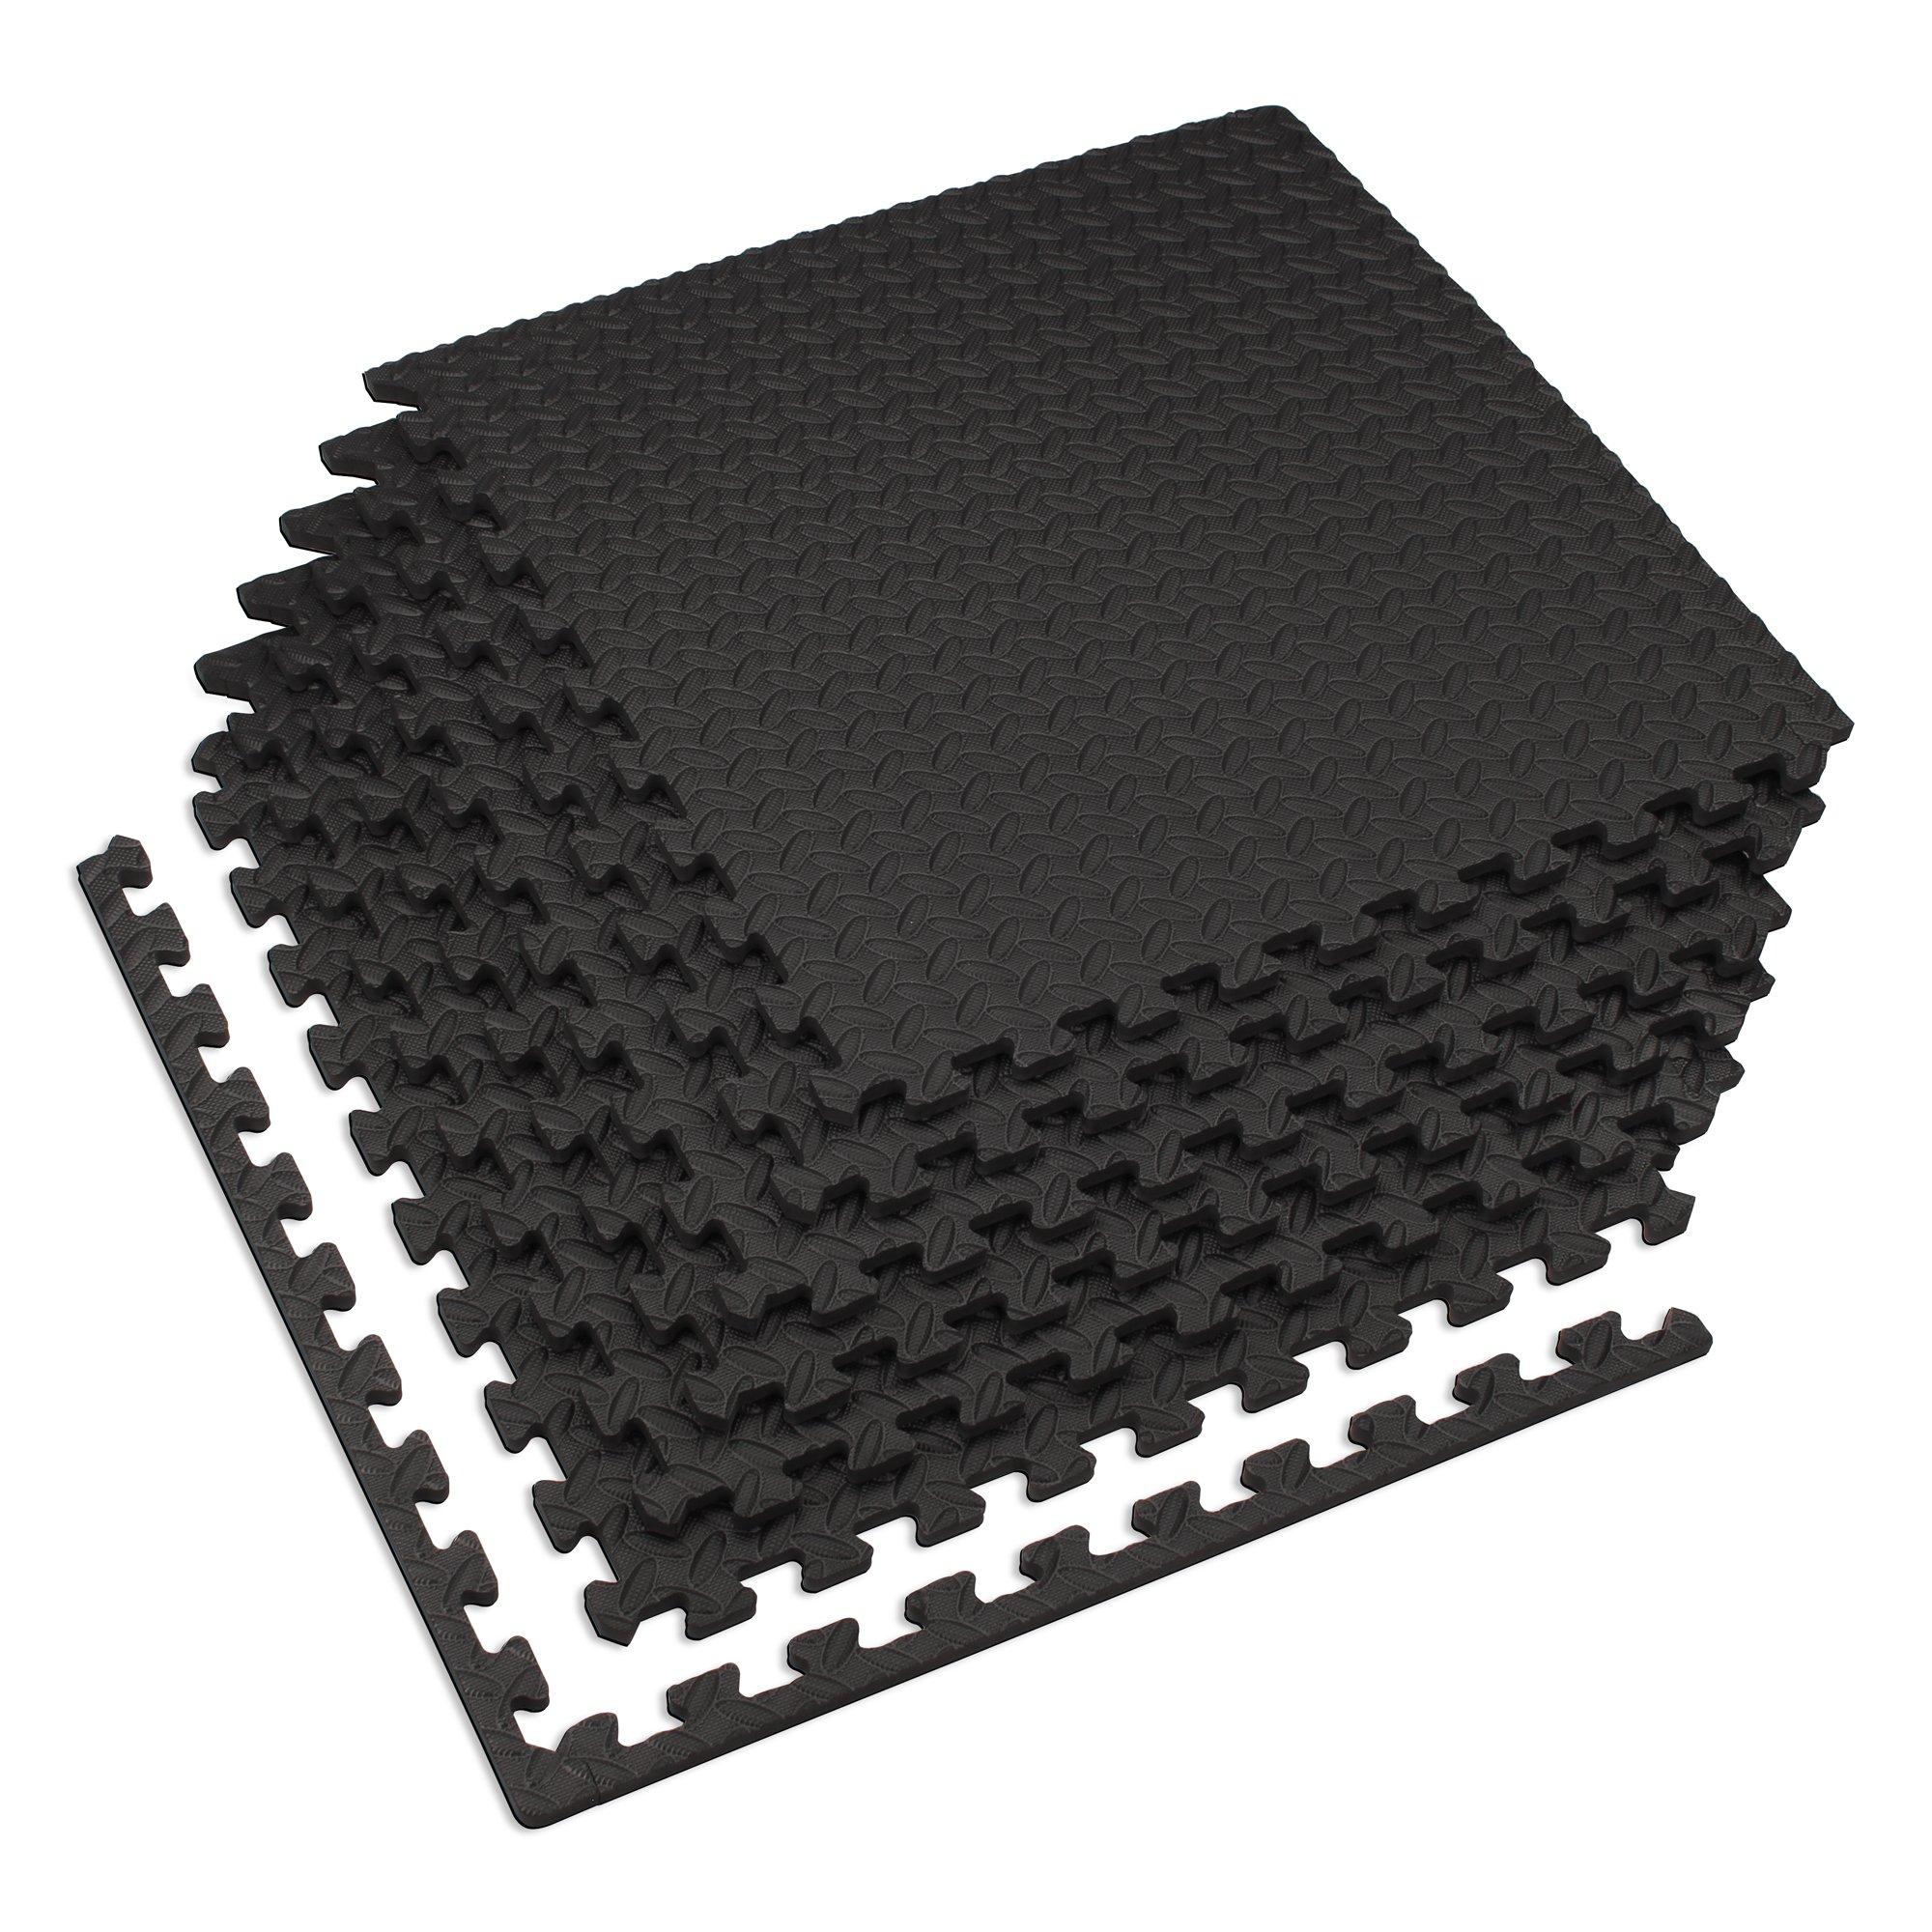 Velotas 24 Sq Ft (6 Tiles) Black 1/2-inch Thick Interlocking Foam Fitness Mat